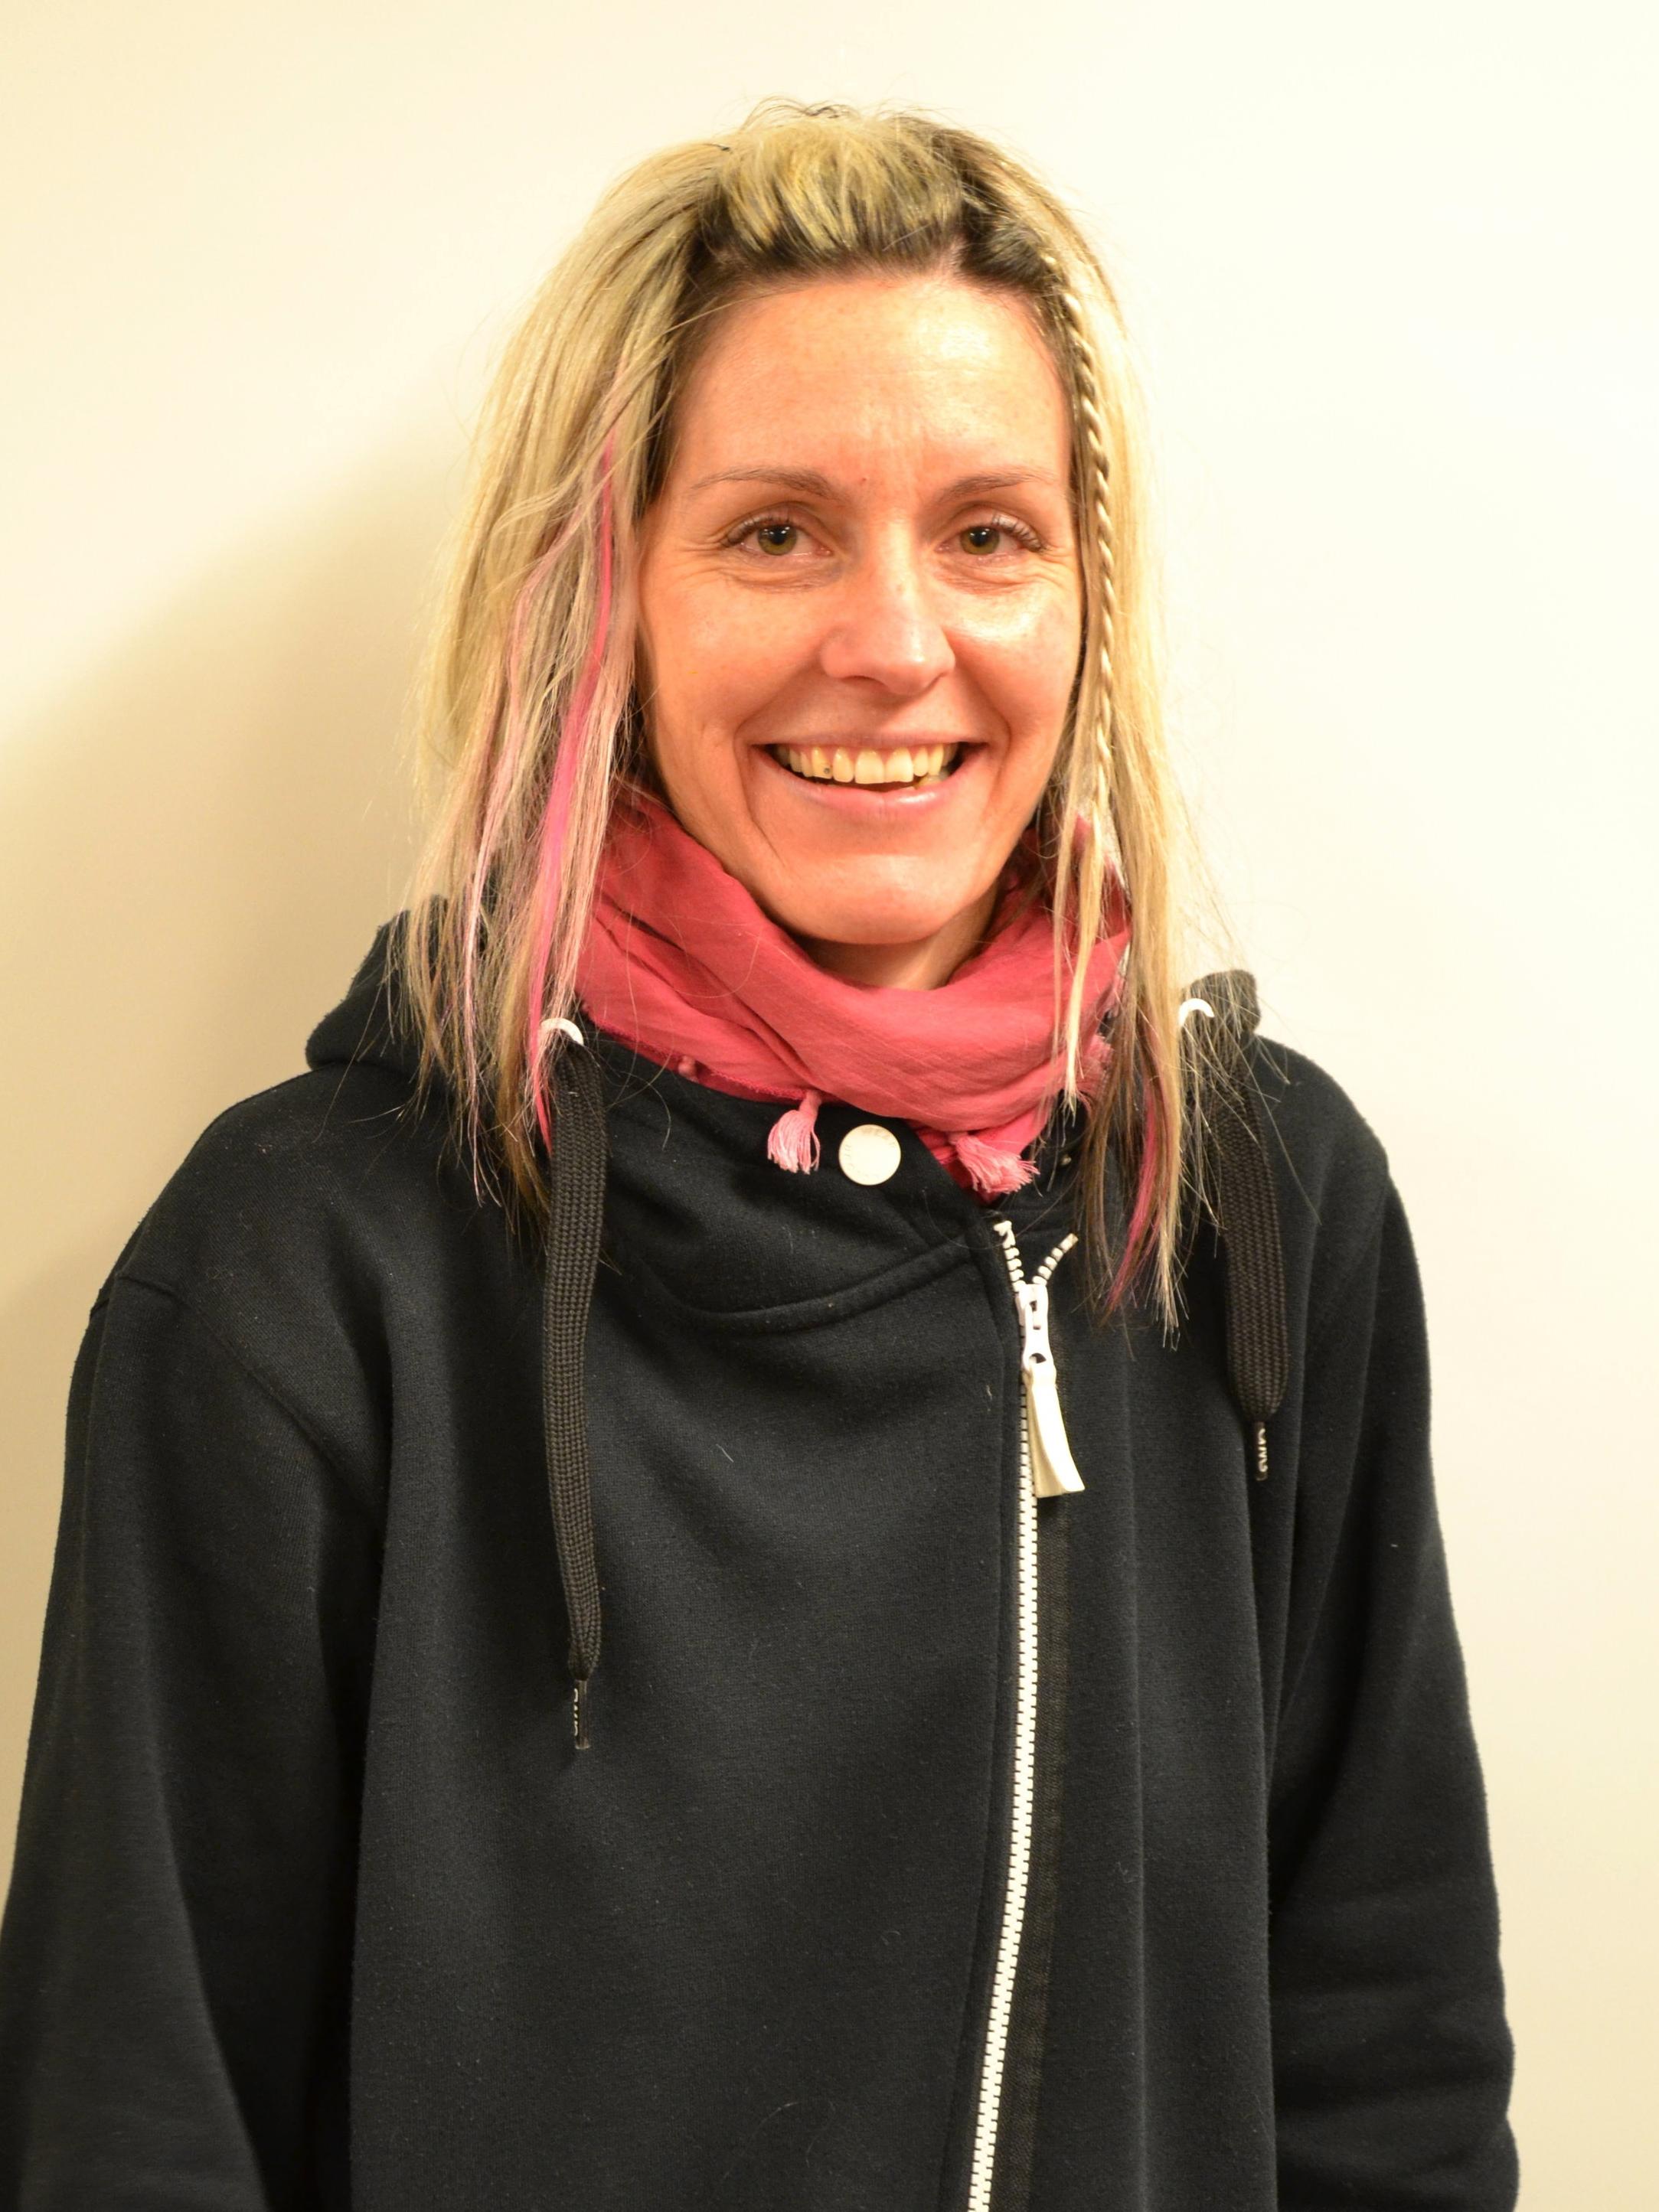 Linda Onsbacke Ekonomi  Tel: 023-161 63    ekonomi@takab.nu